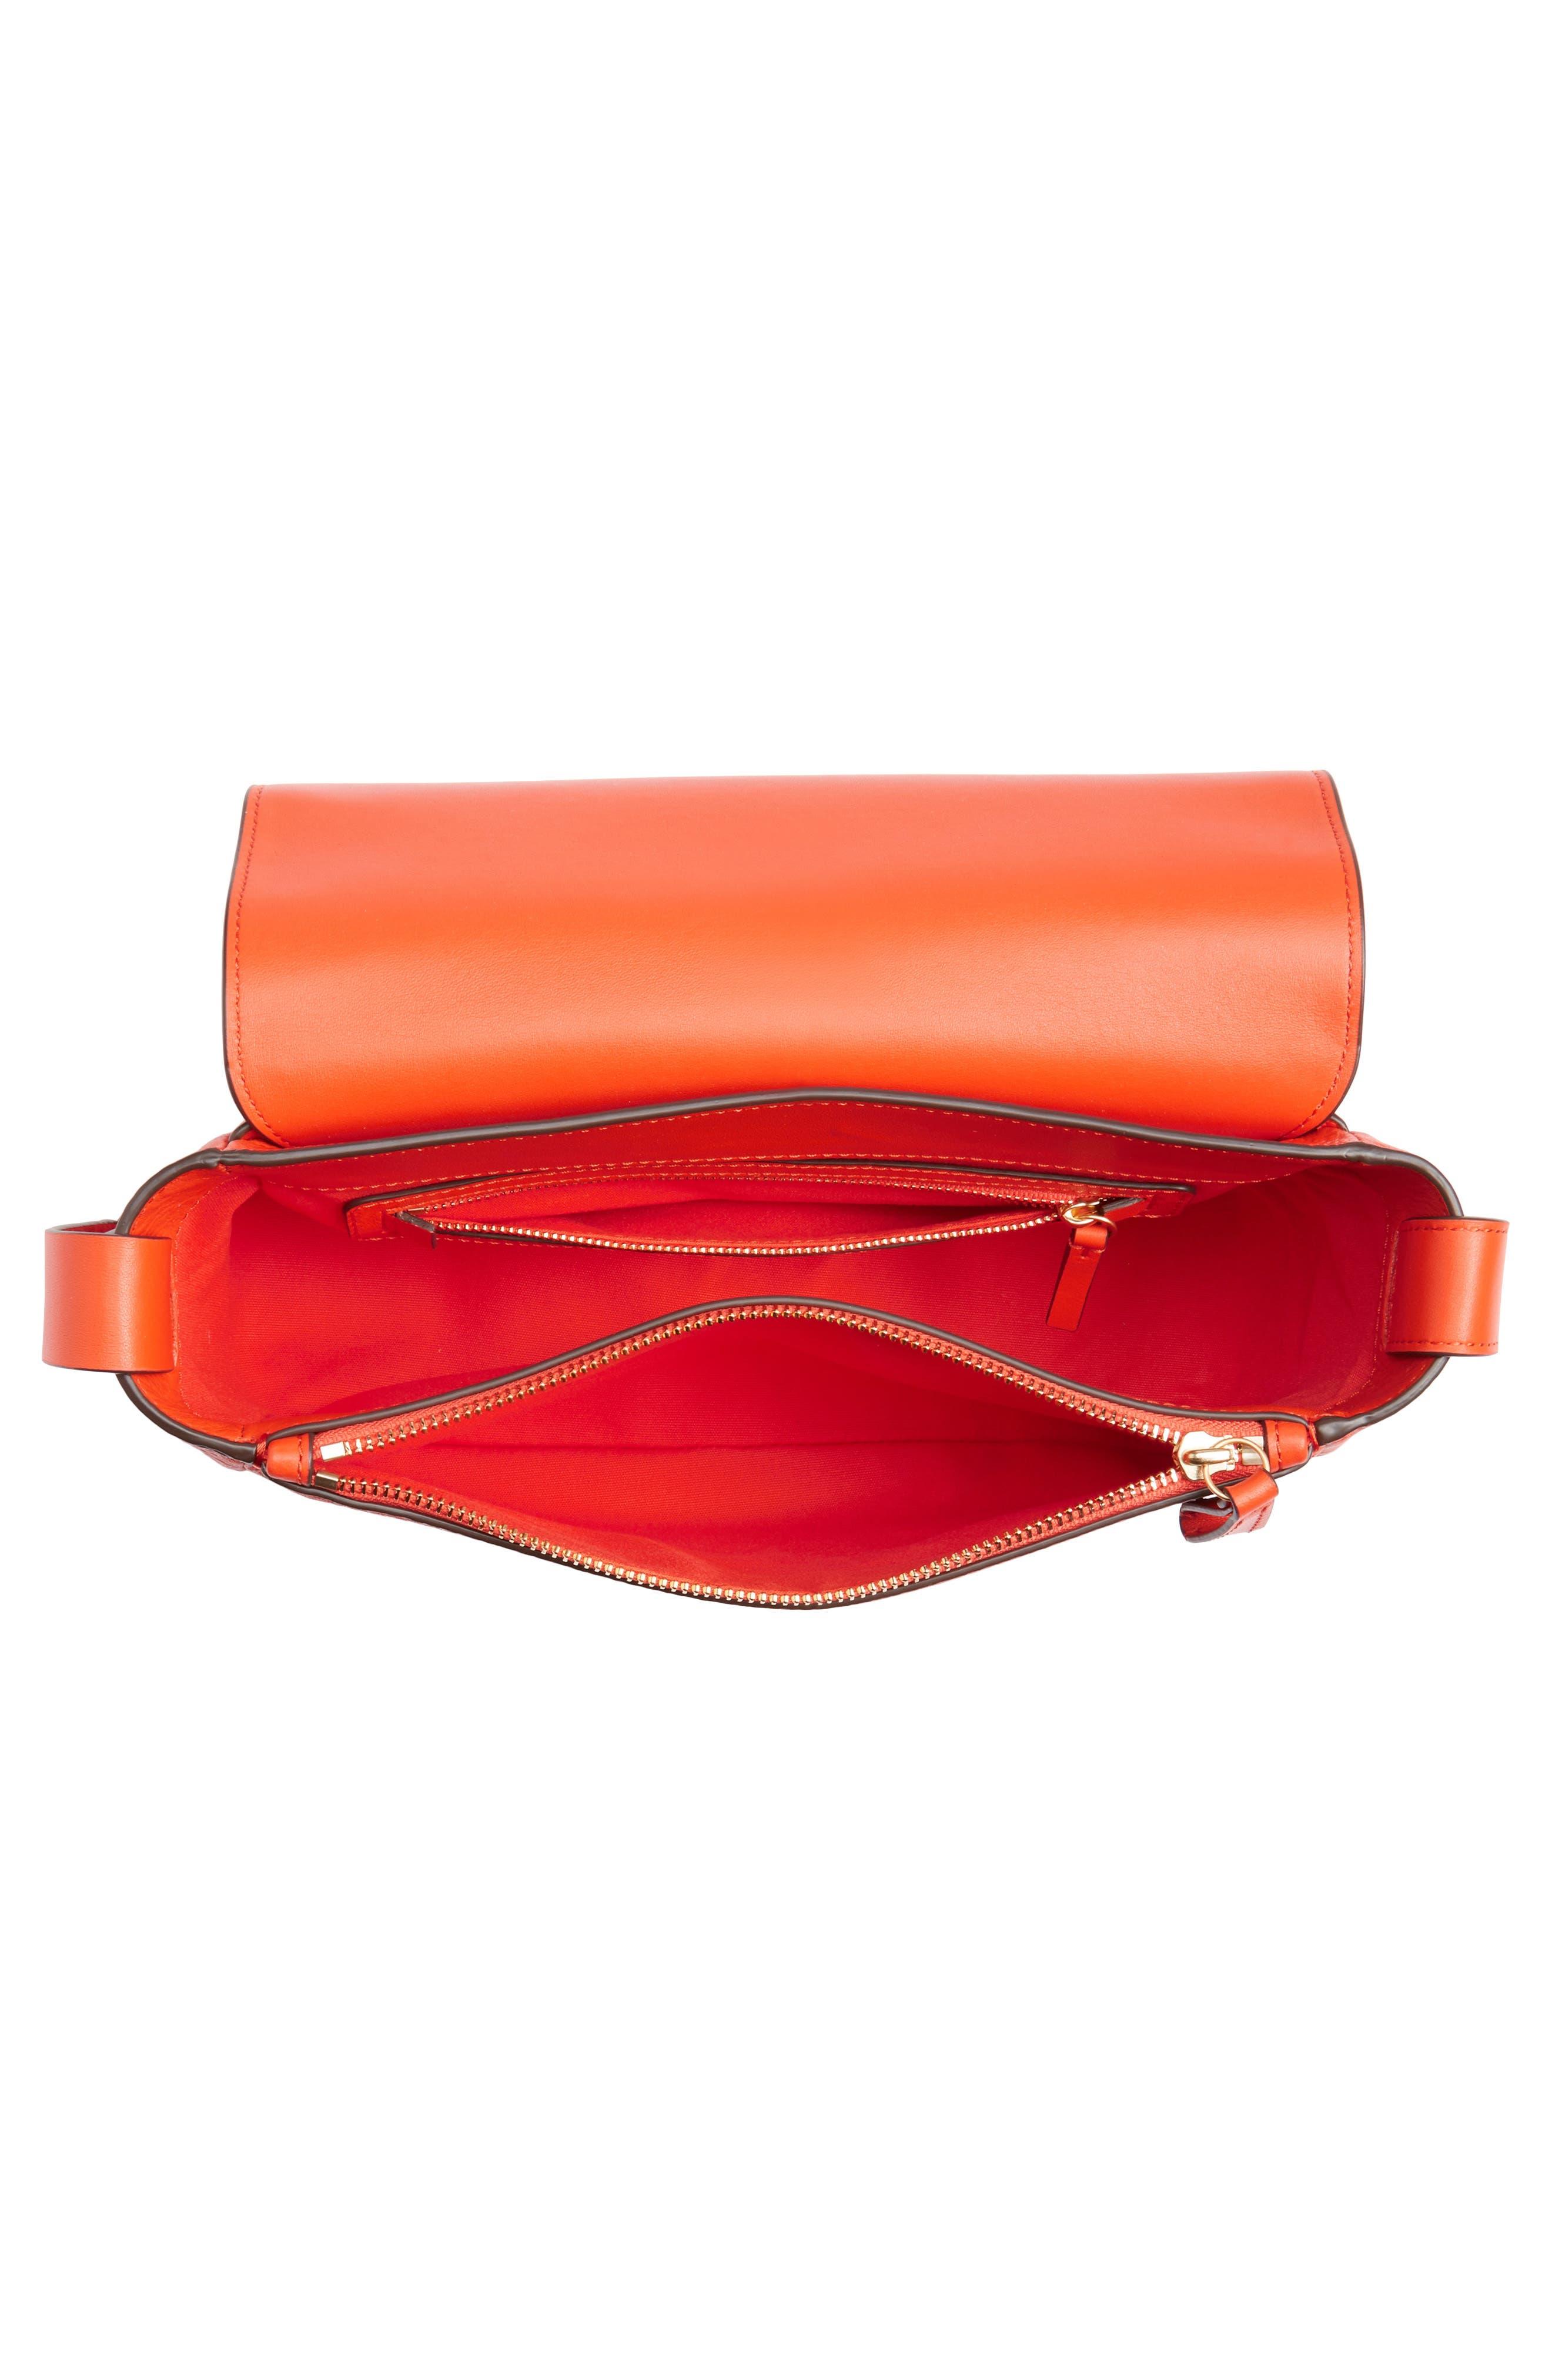 Block-T Pebbled Leather Shoulder Bag,                             Alternate thumbnail 4, color,                             Spicy Orange